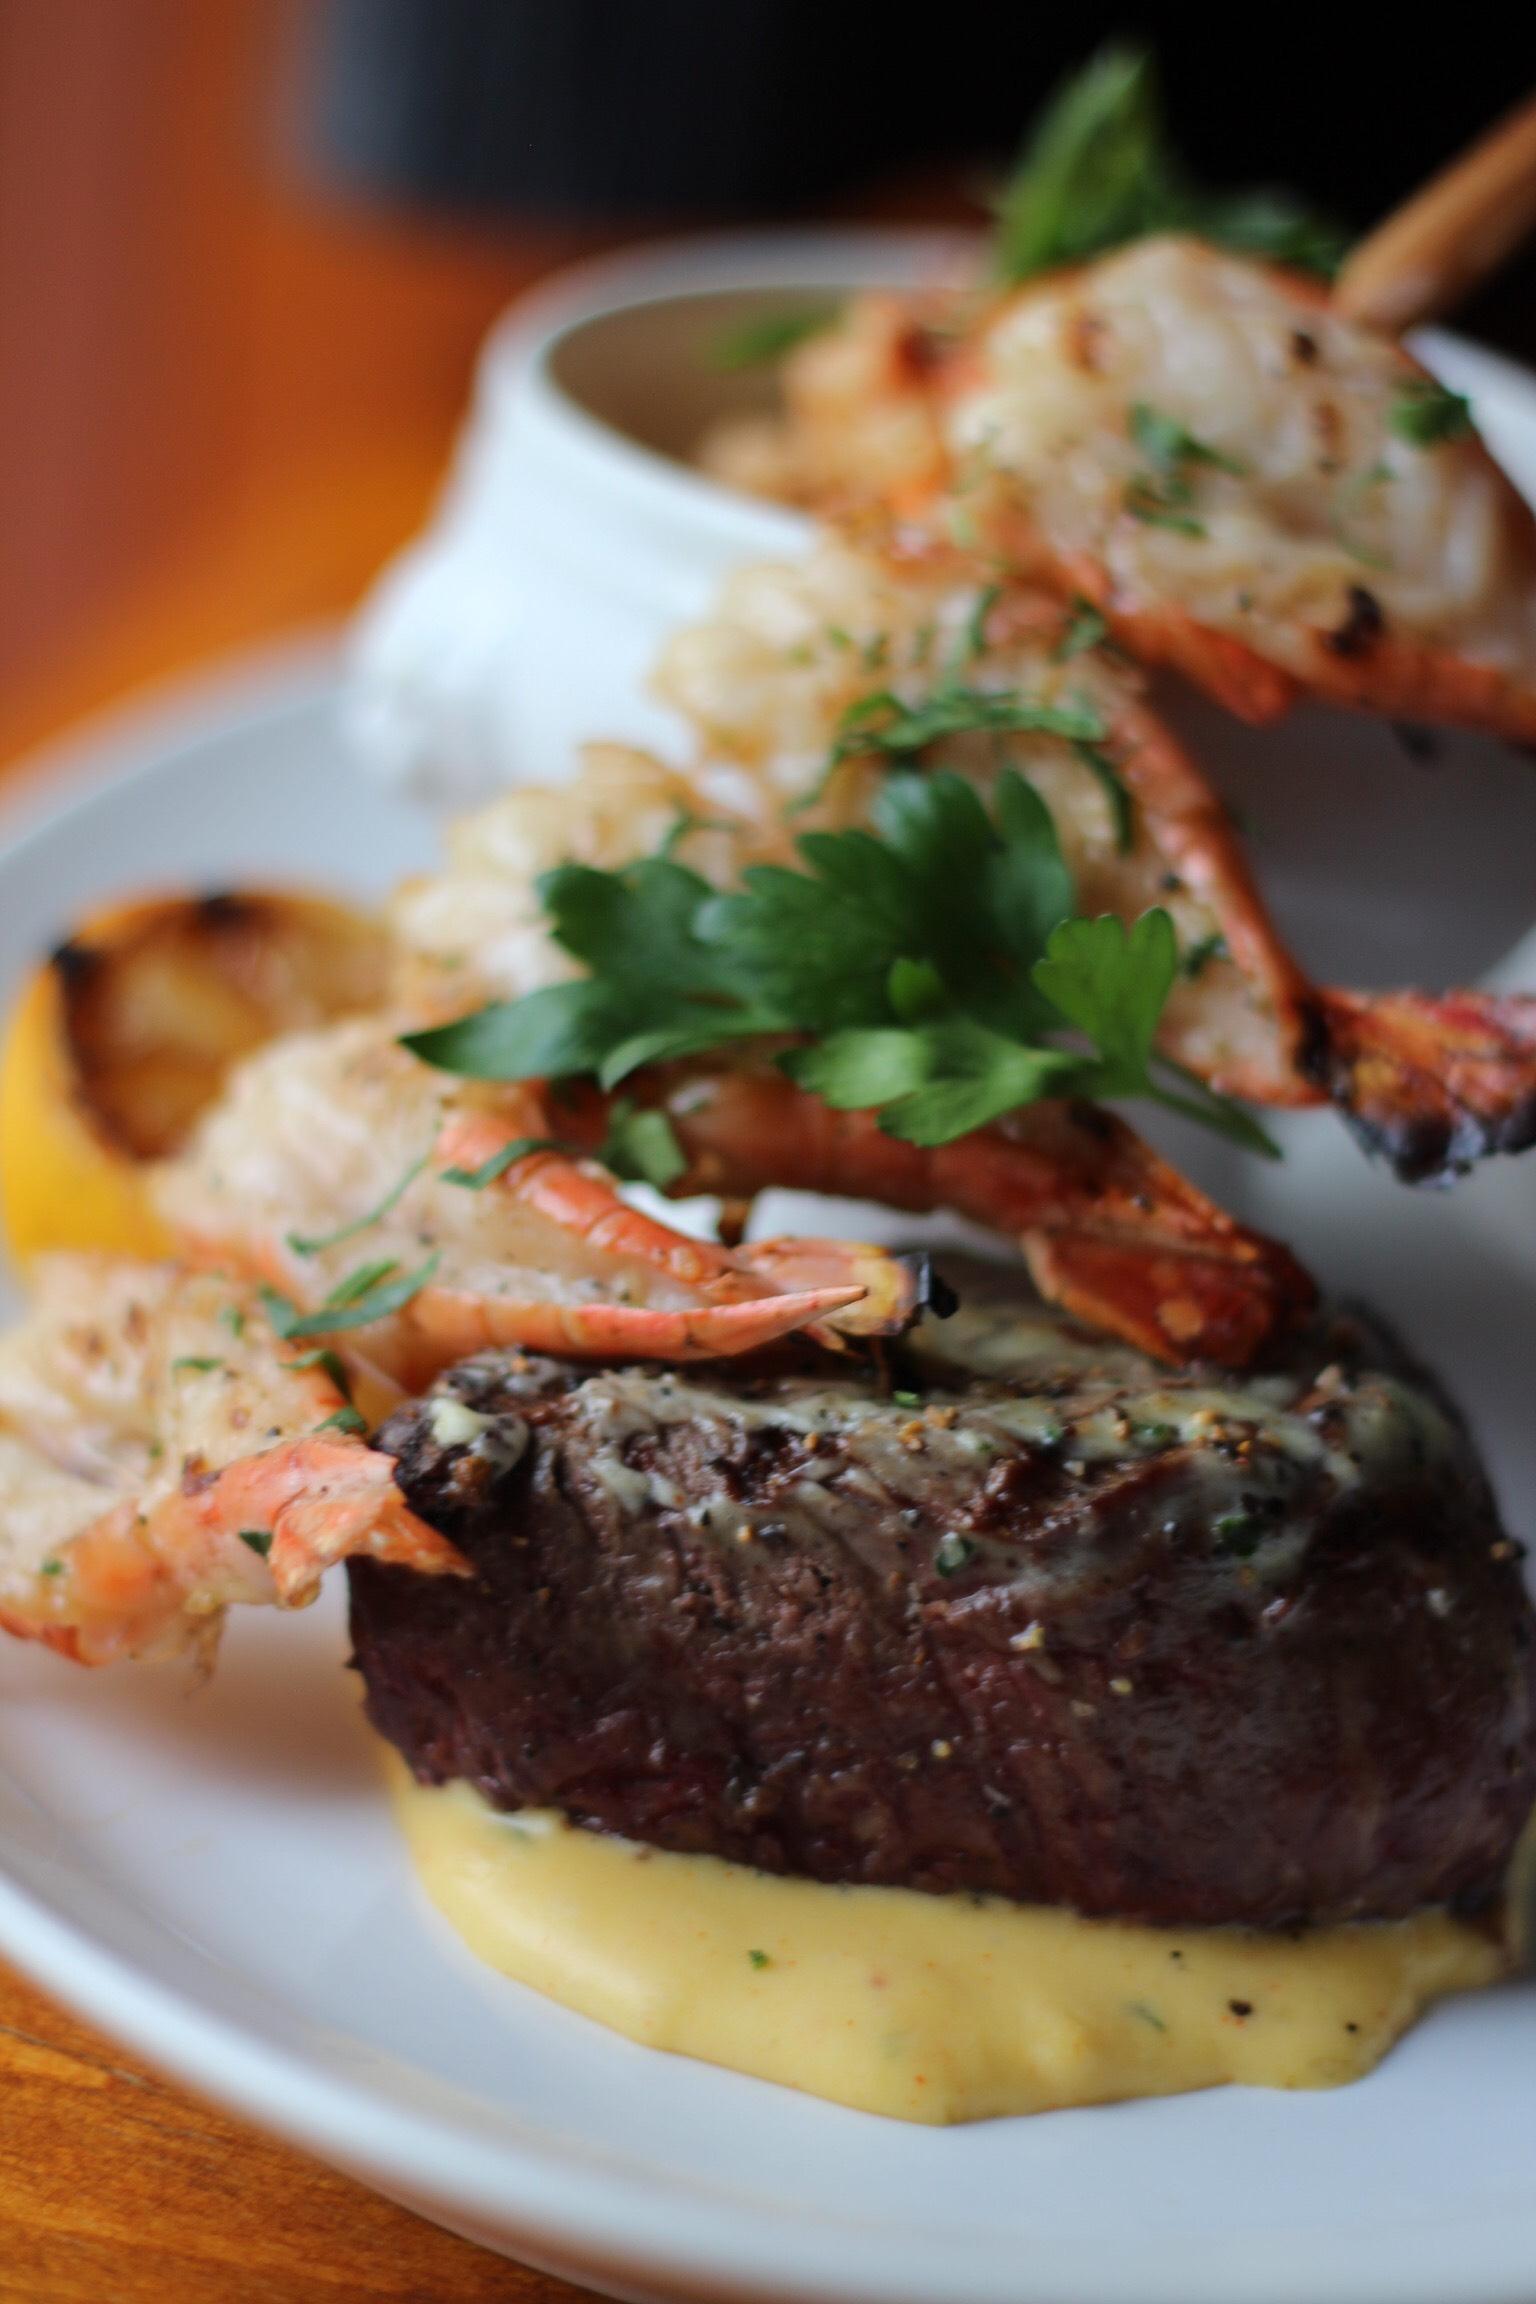 Saltlik, A Rare Steakhouse